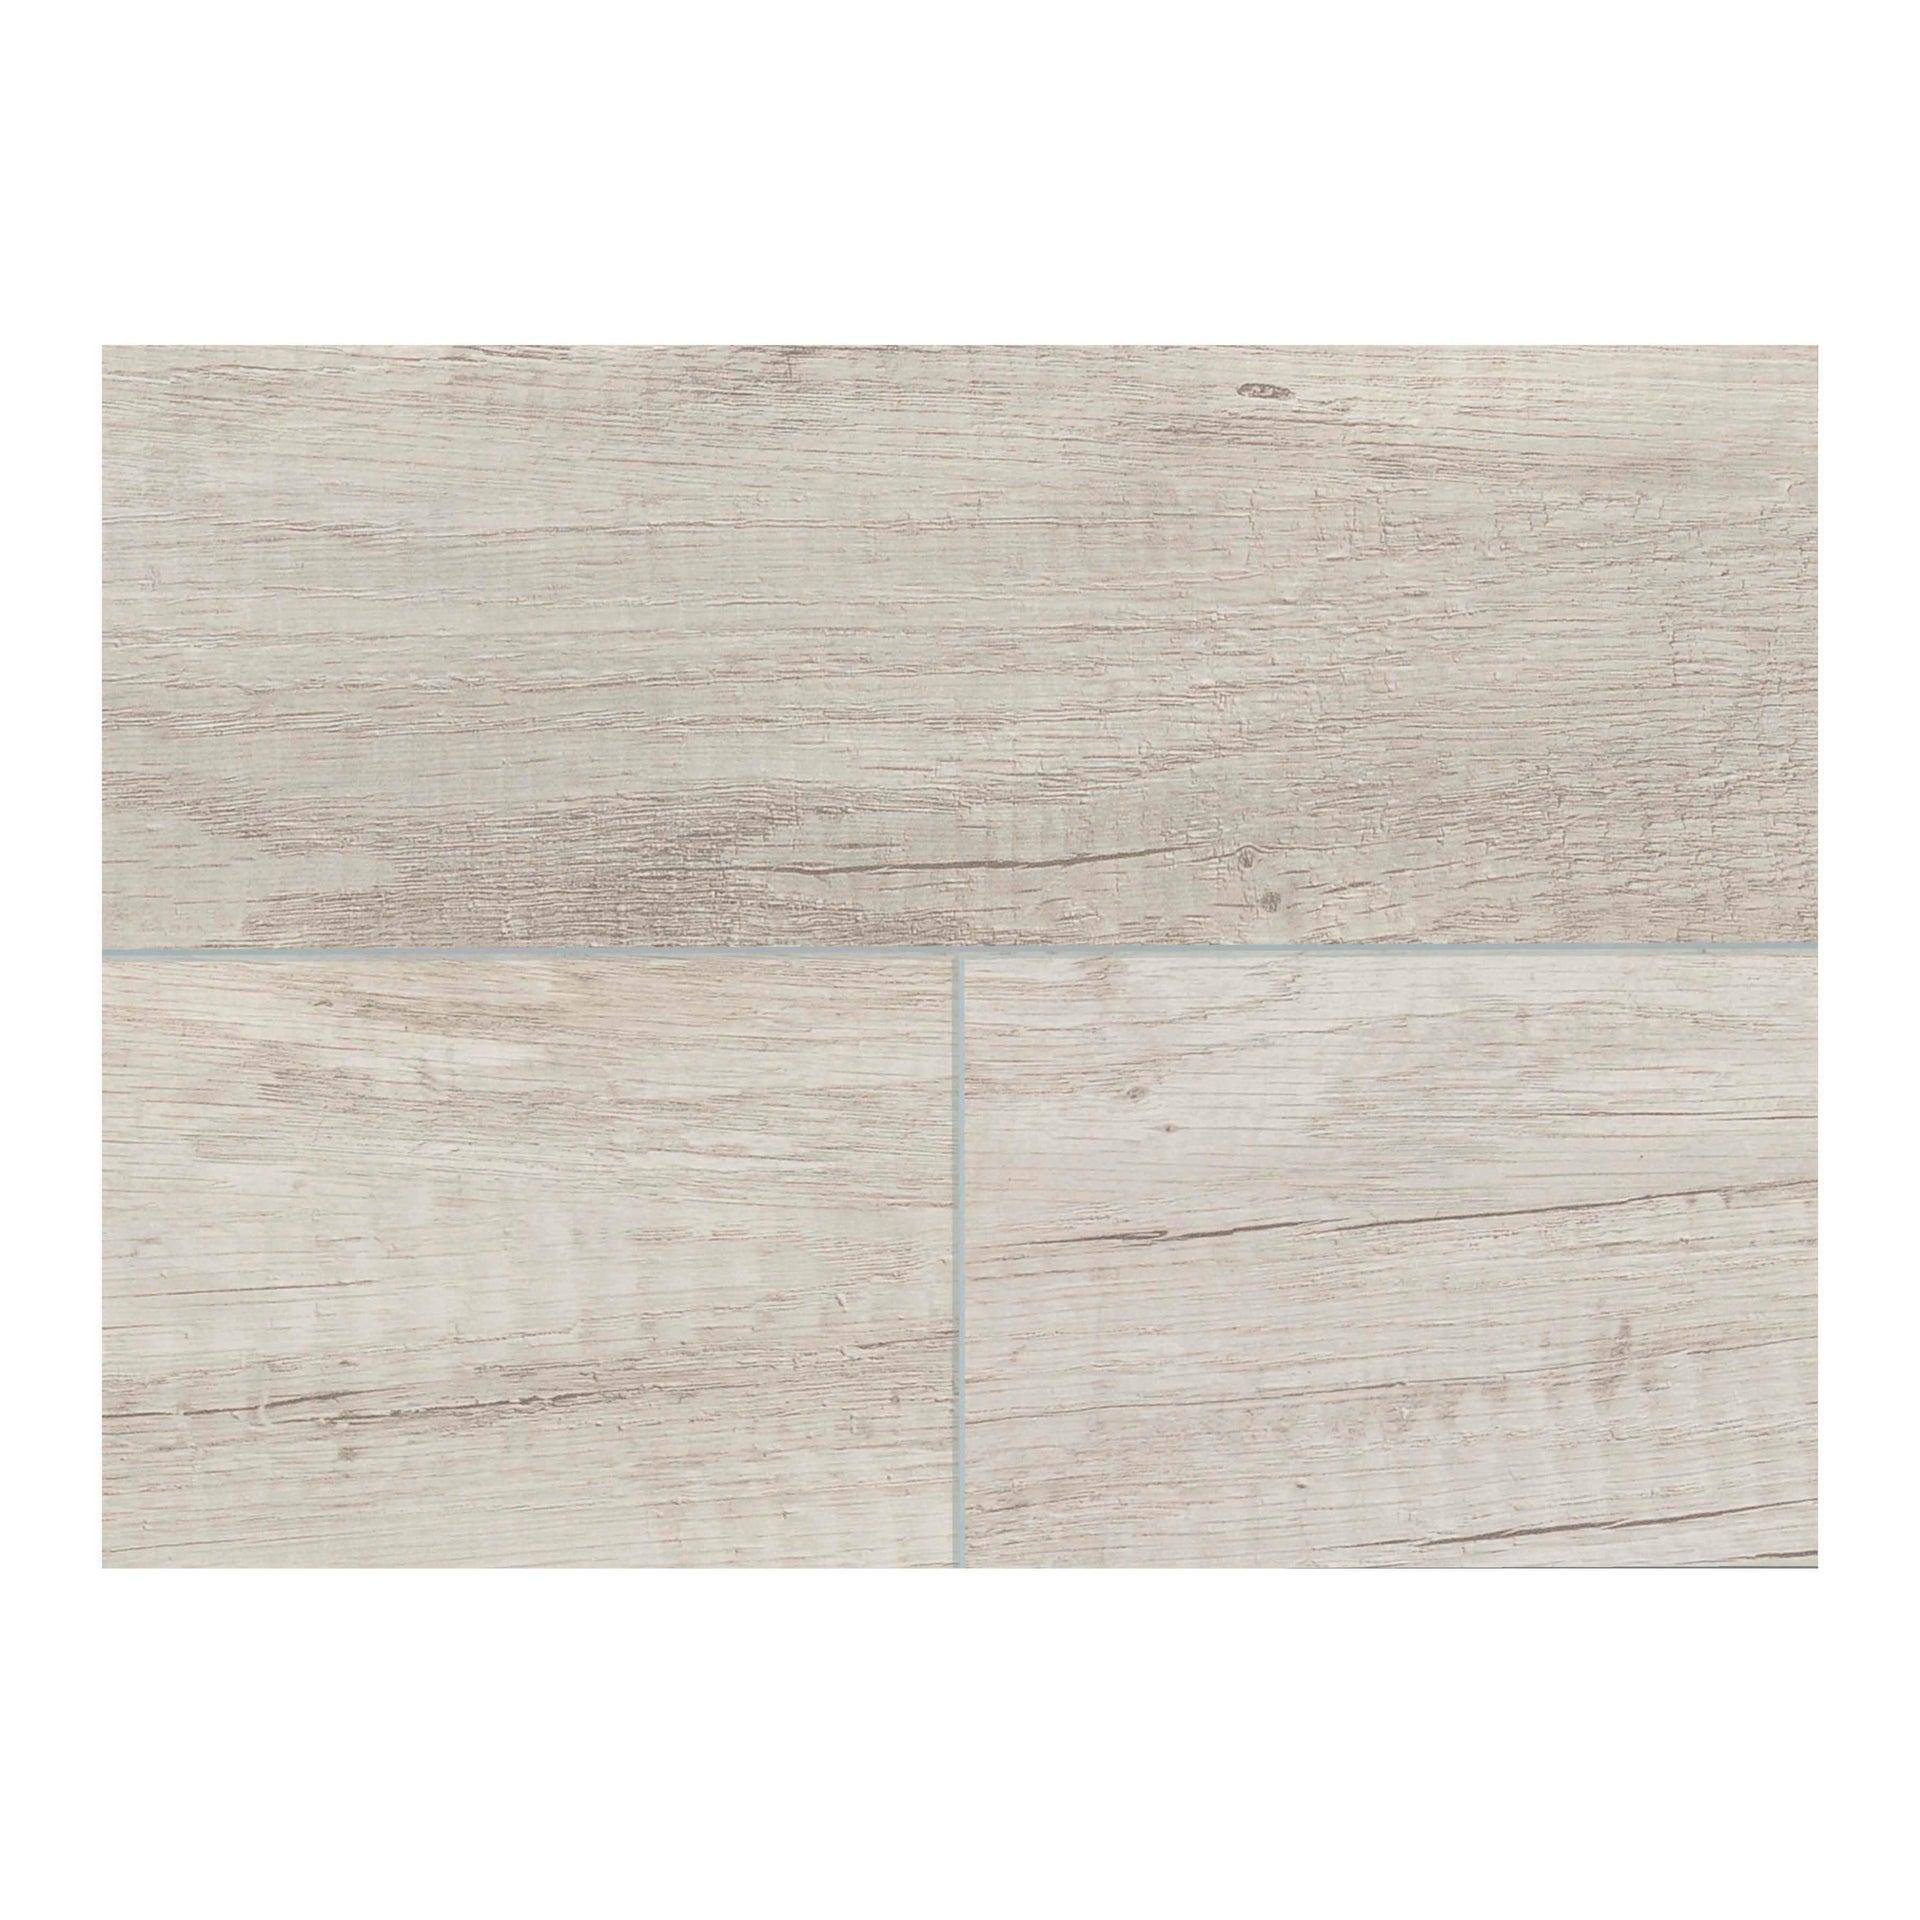 Pavimento laminato H2O Oak Sp 8 mm grigio / argento - 8